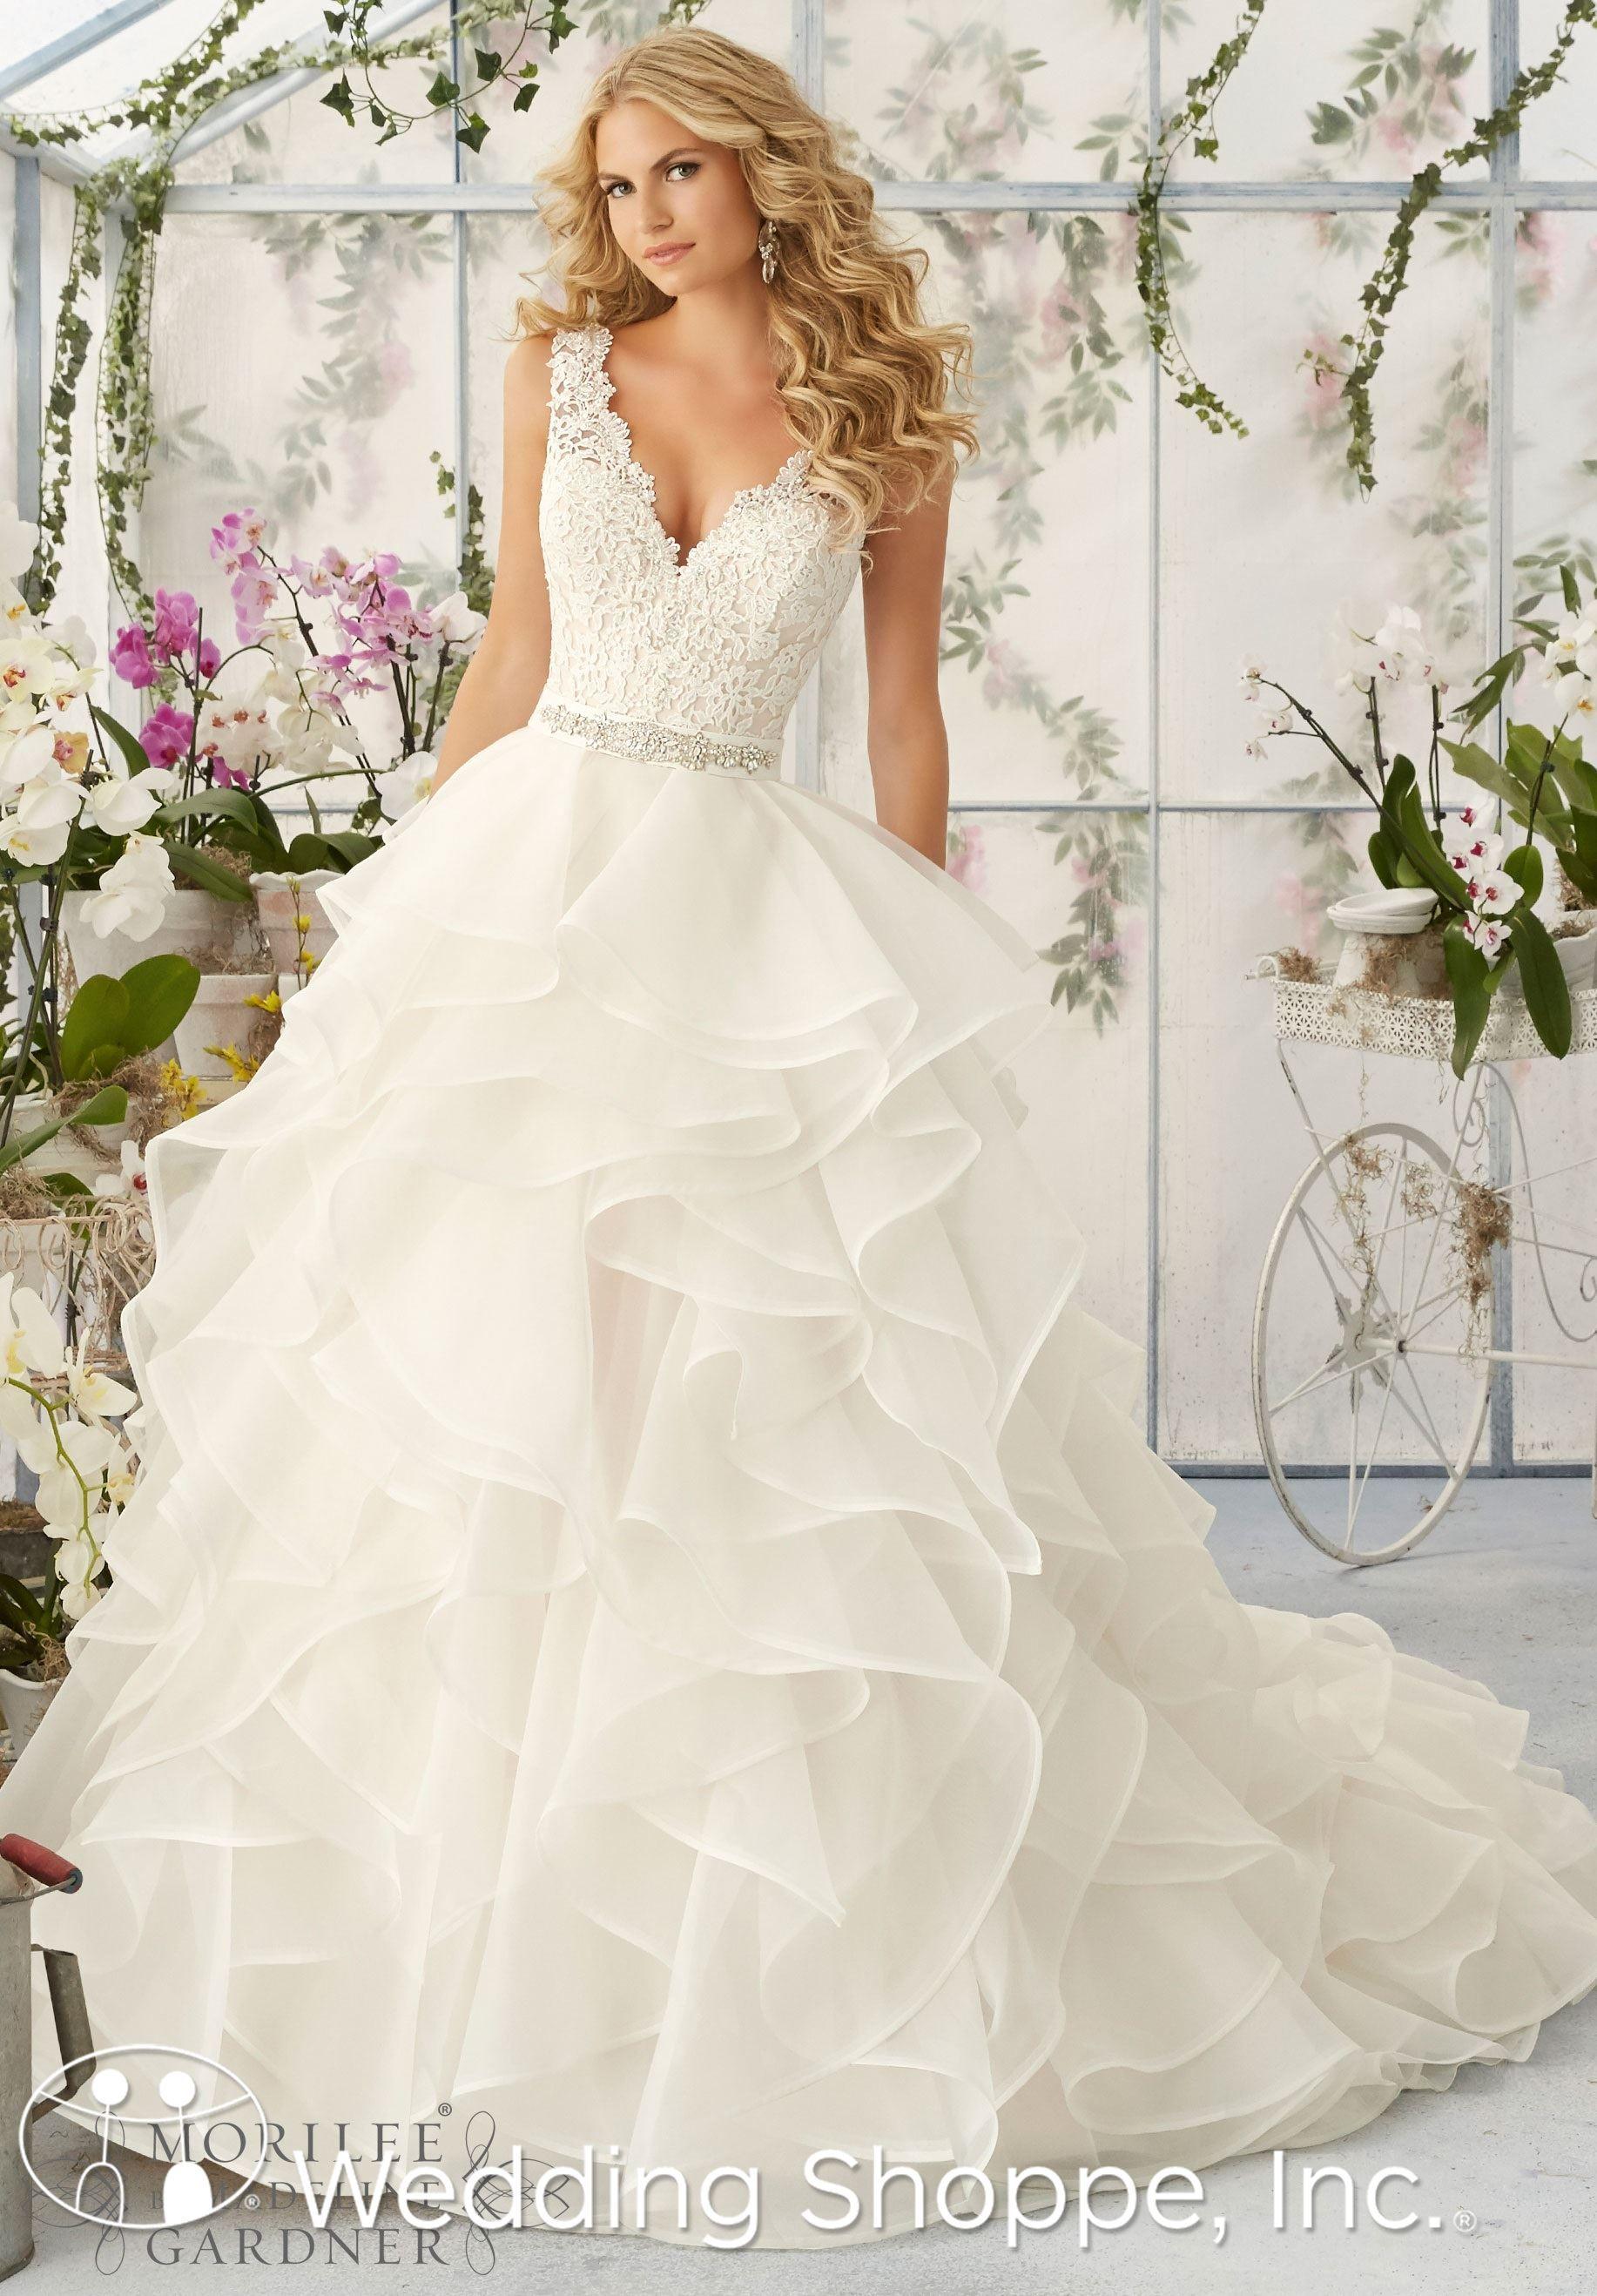 Mori Lee Bridal Gown 2805 Organza Skirt Wedding Dress Ball Gowns Wedding Lace Top Wedding